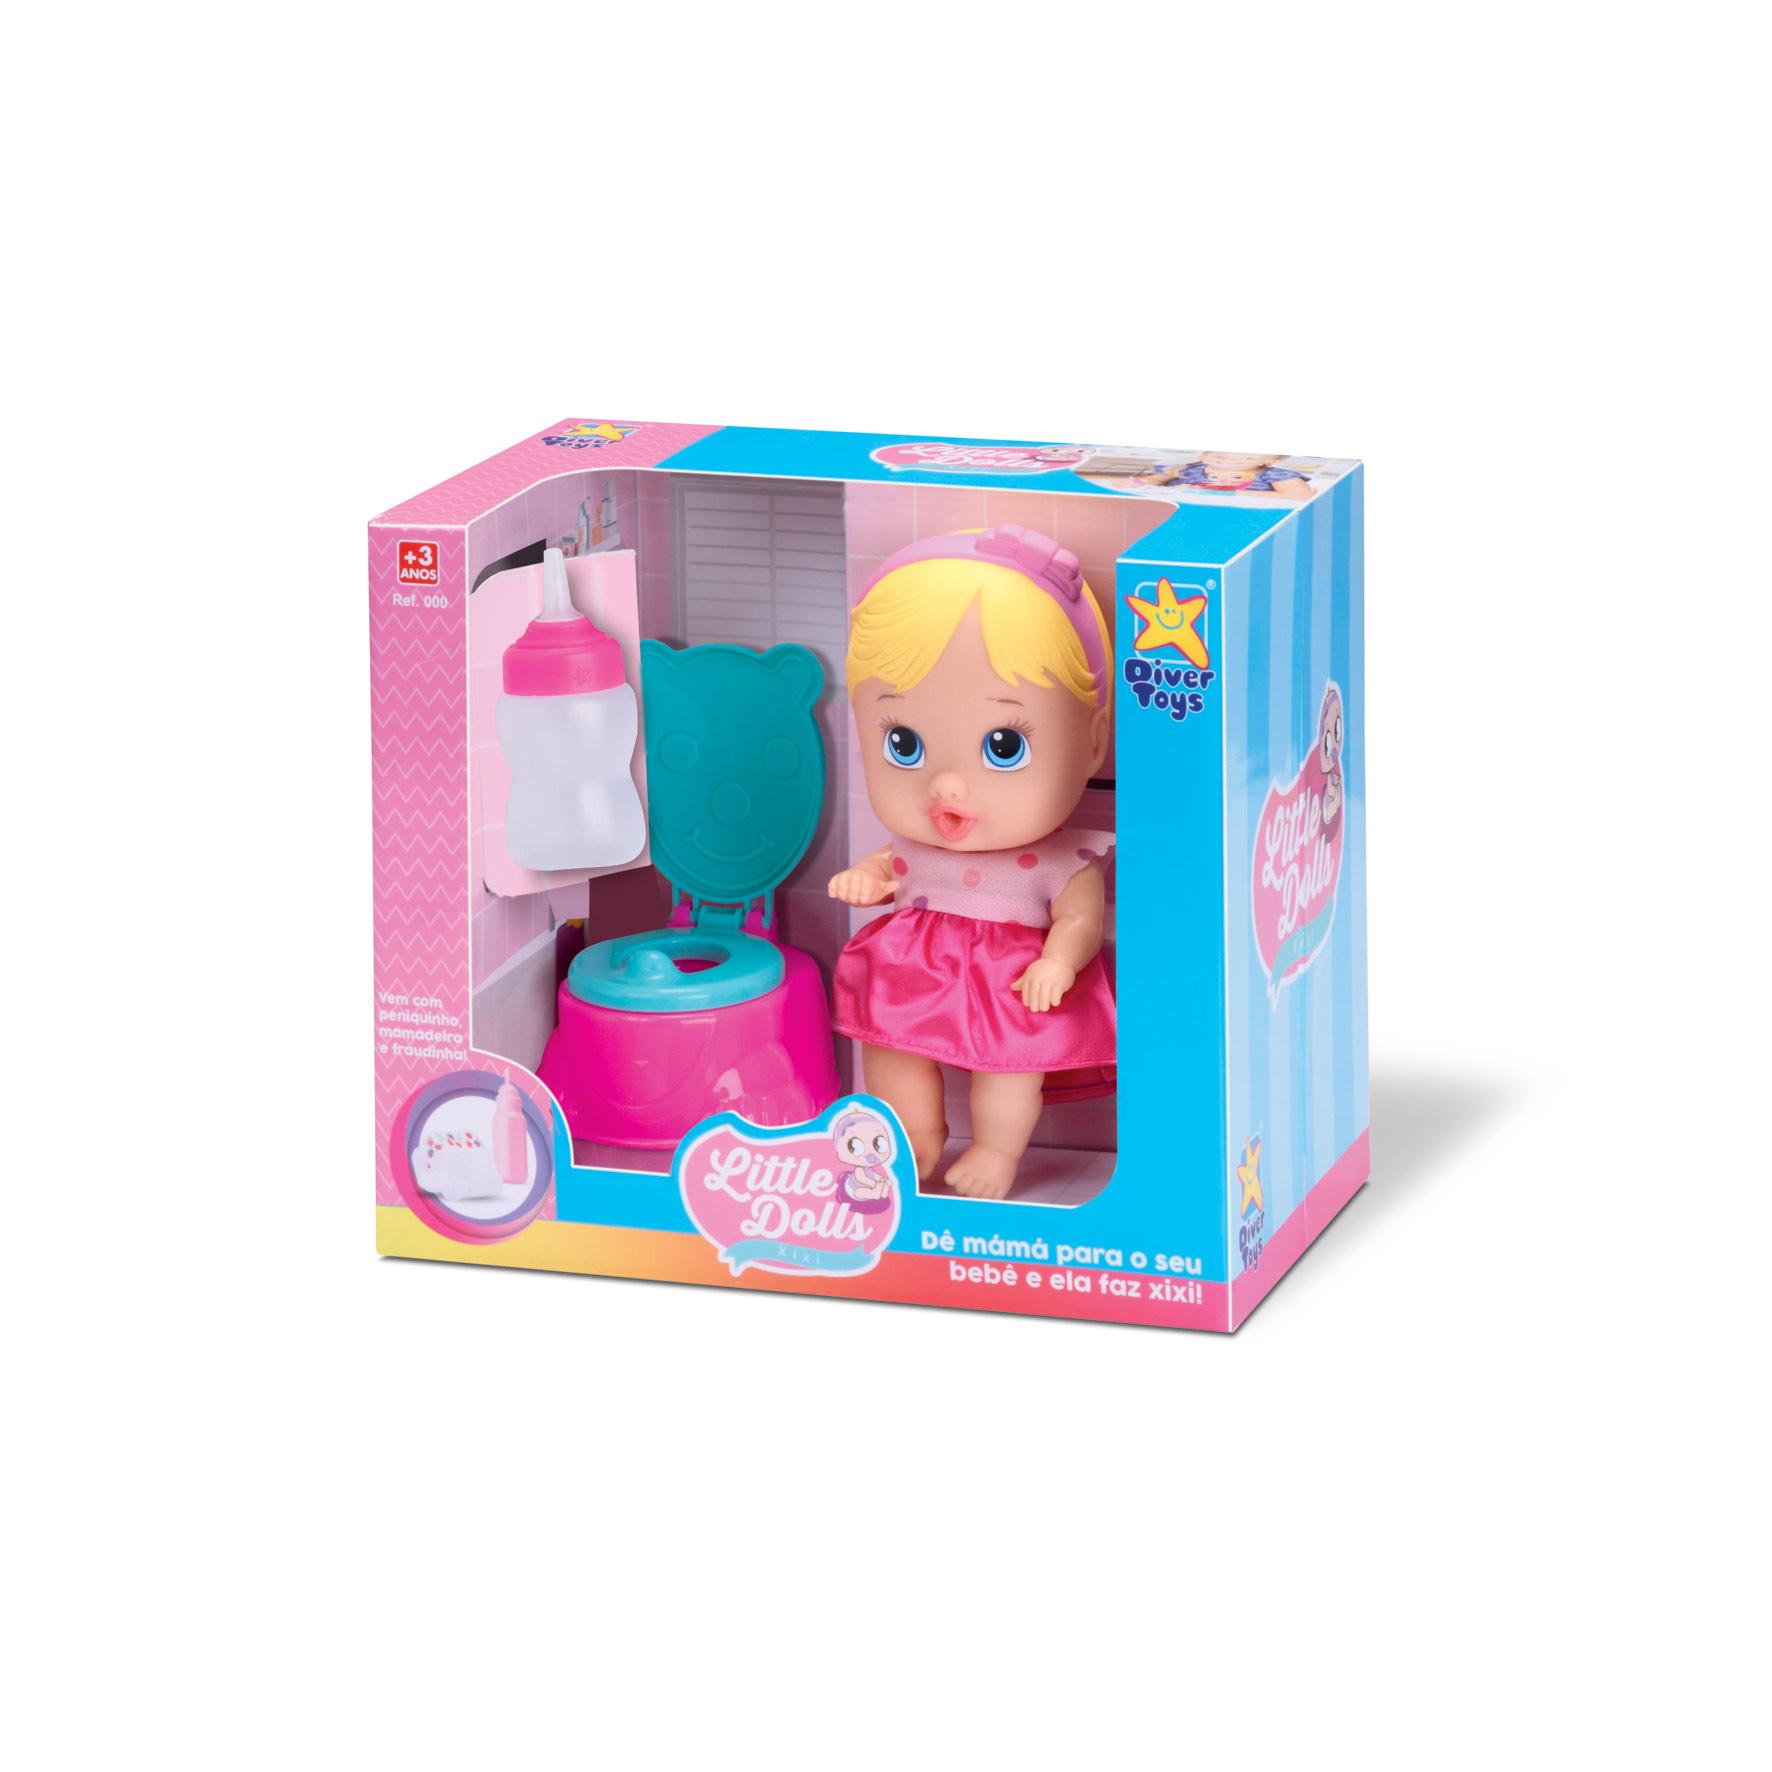 Boneca Baby Faz Xixi Little Dolls C/privadinha Divertoys Top